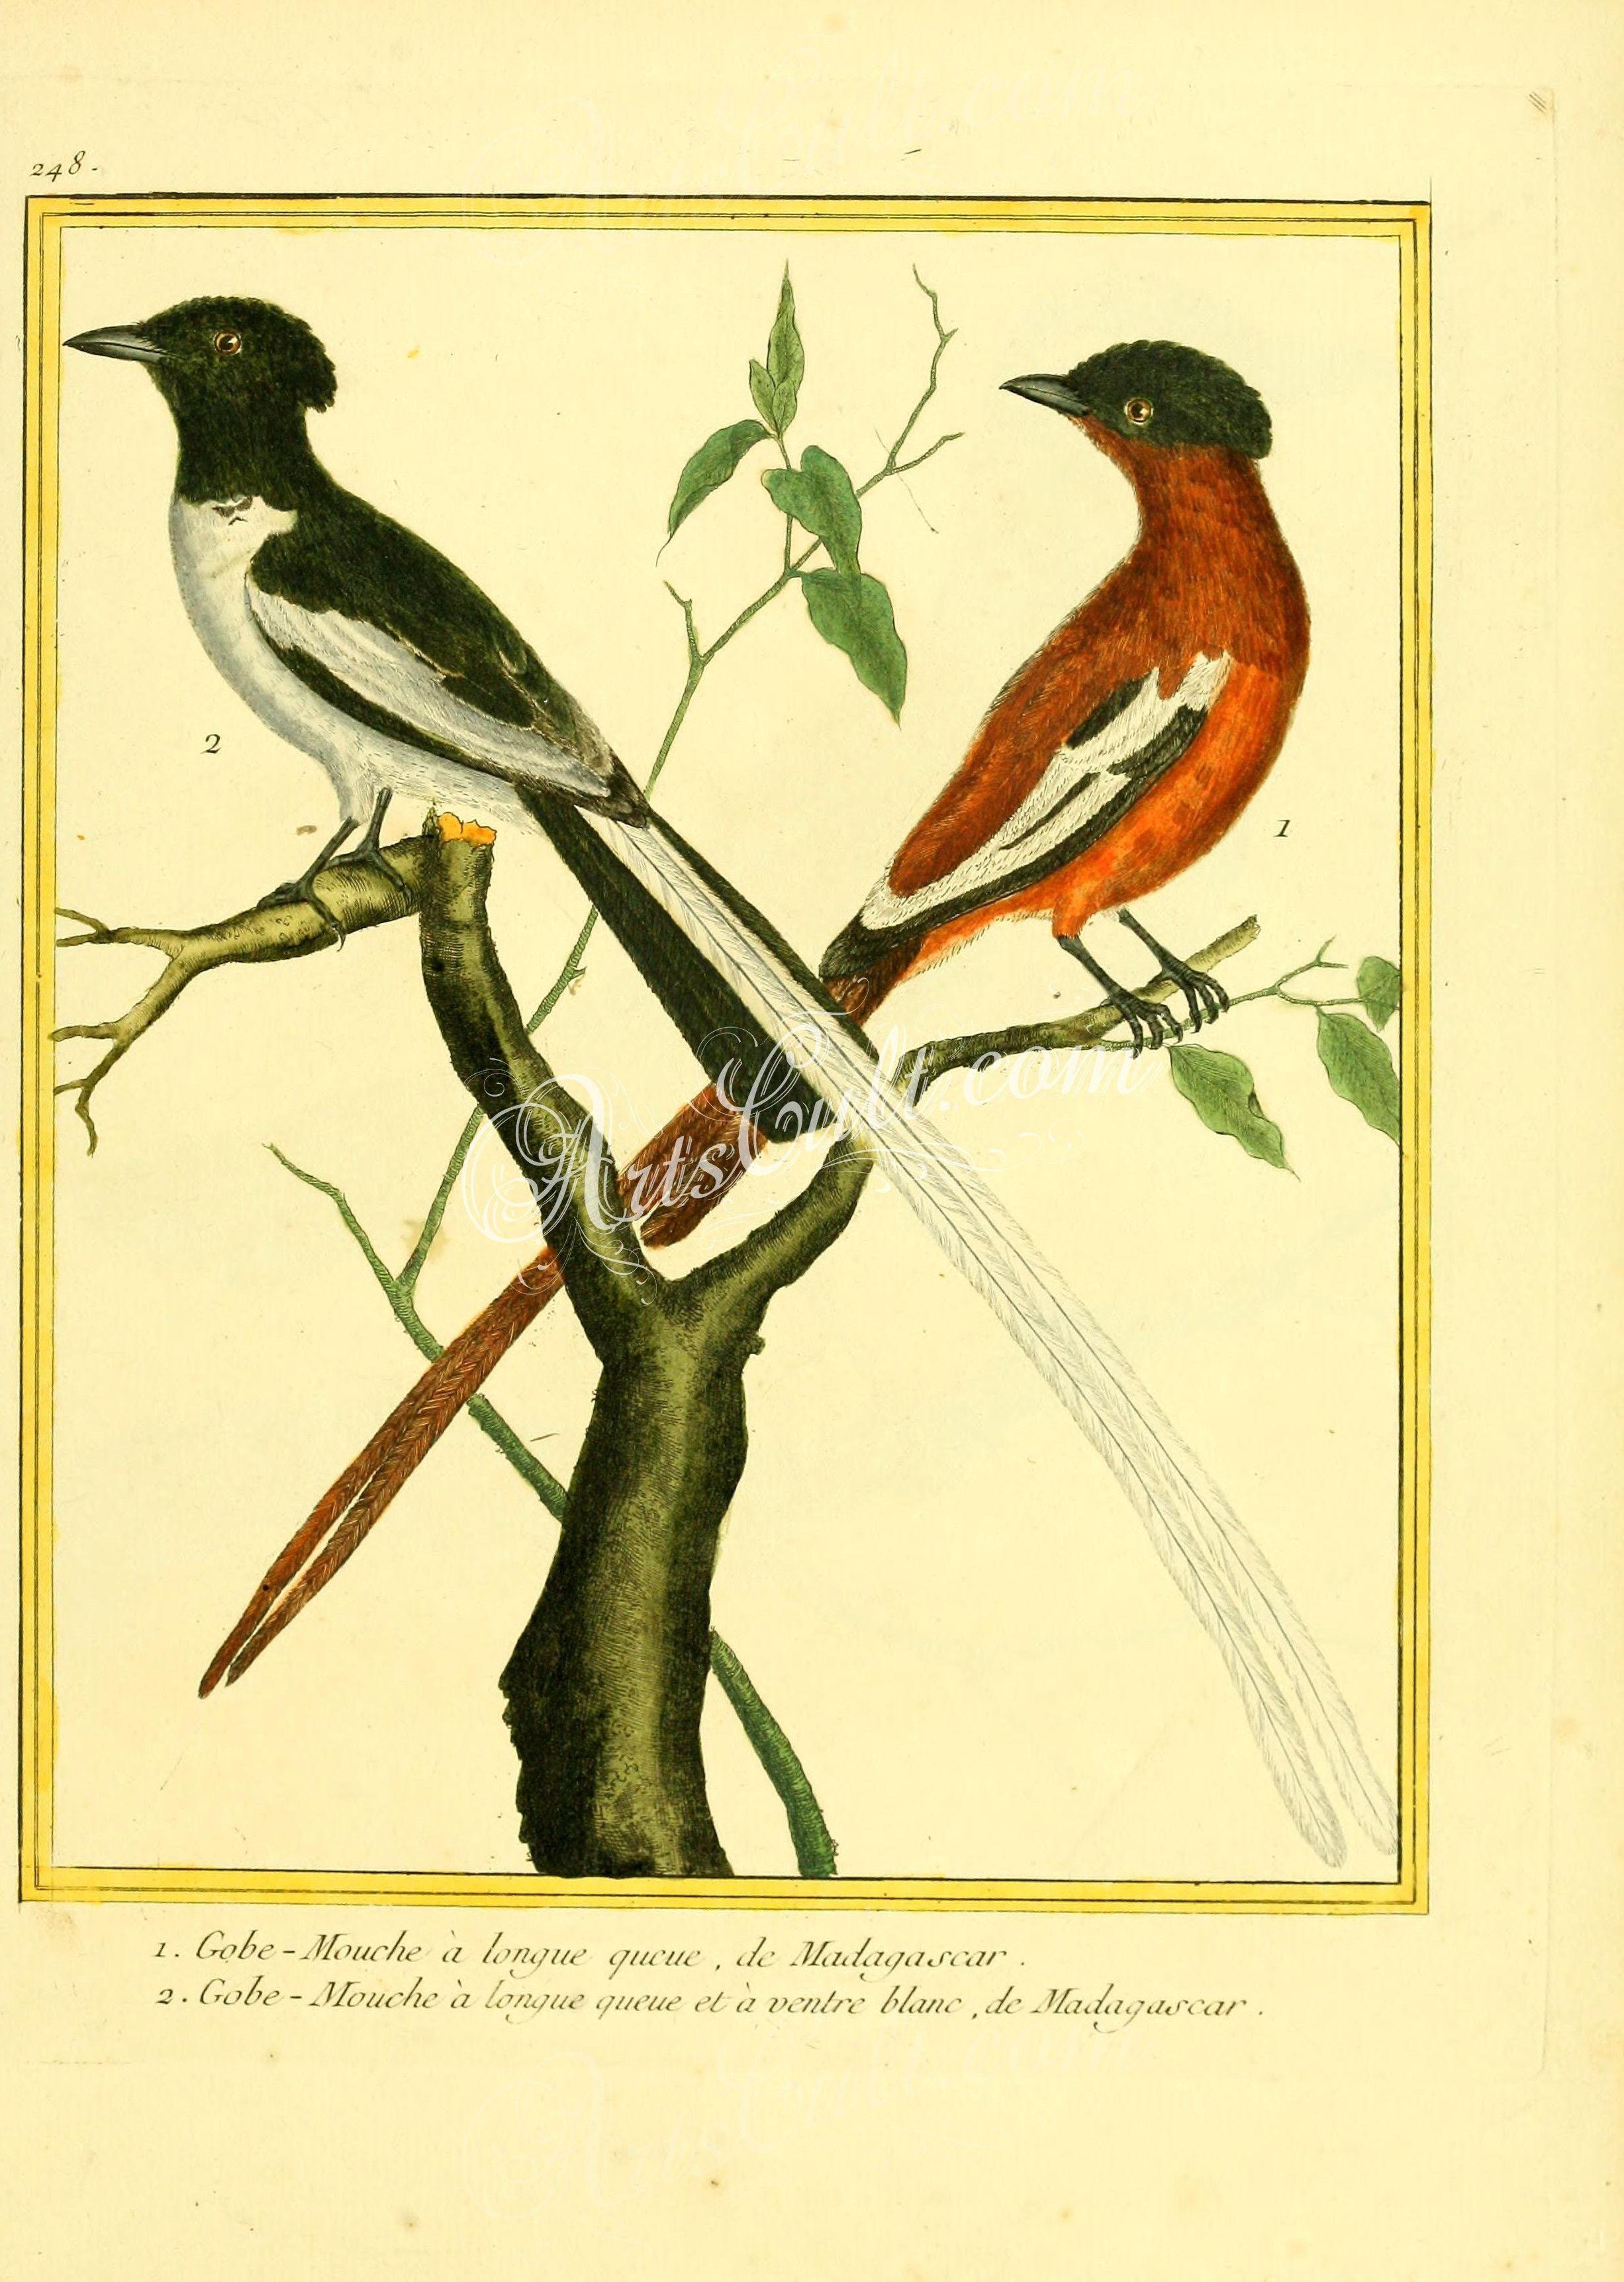 Birds Malagasy paradise flycatcher botanical floral botany